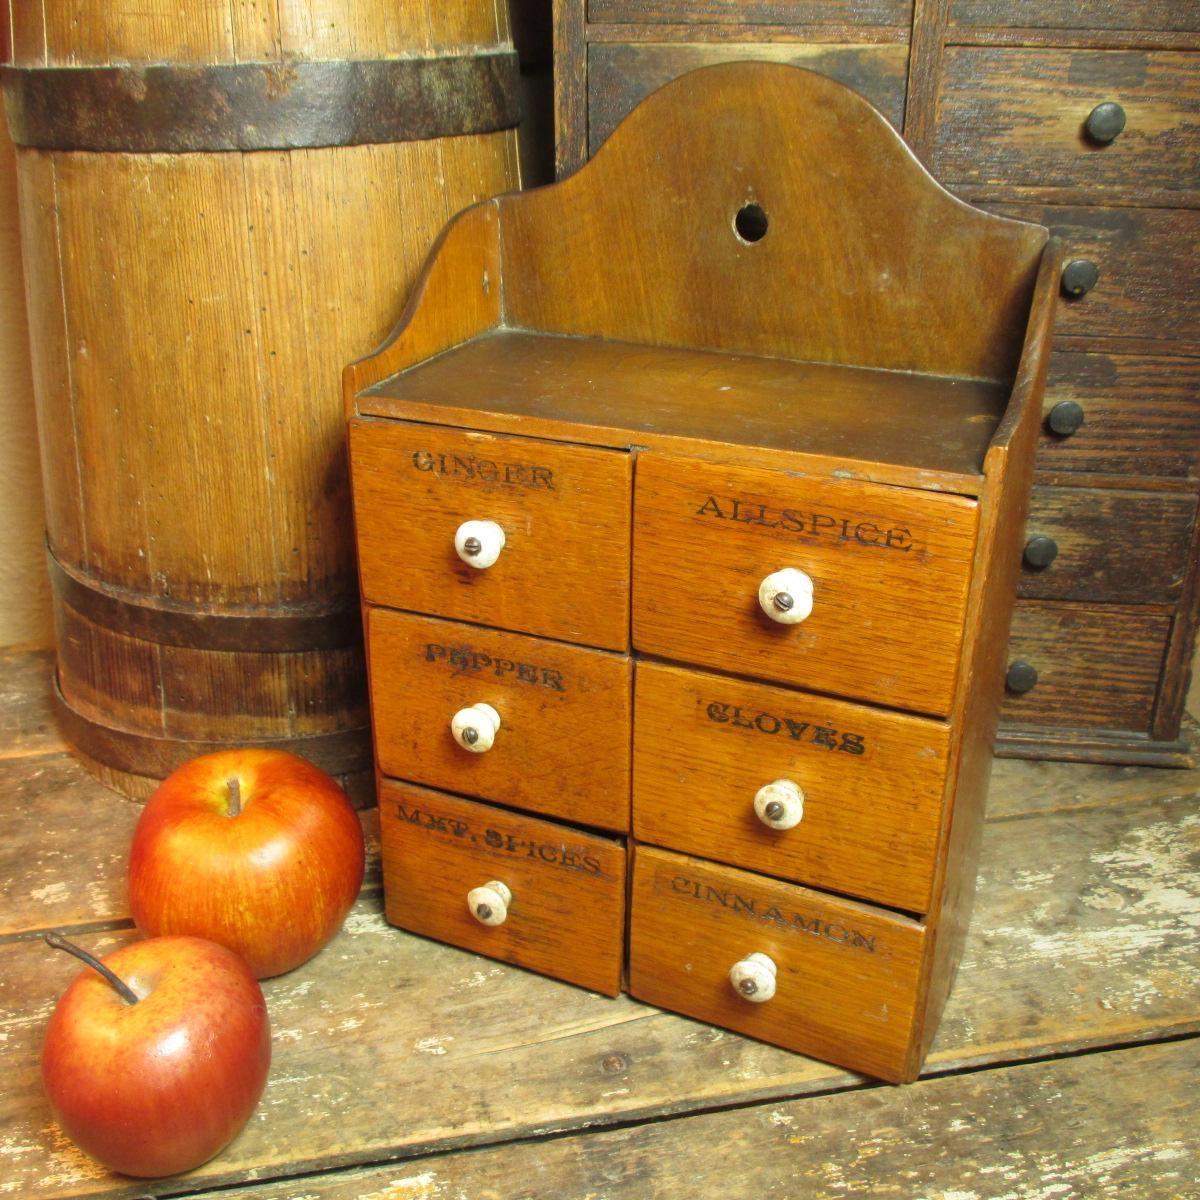 Grandma's Sweet Old Antique Six Drawer 'Pure Food' Spice Chest Cabinet - 1800's - Golden Oak #HannahsHouseAntiques #Primitives https://www.rubylane.com/item/497177-9464/Grandmax27s-Sweet-Antique-Six78-Drawer-x27Pure